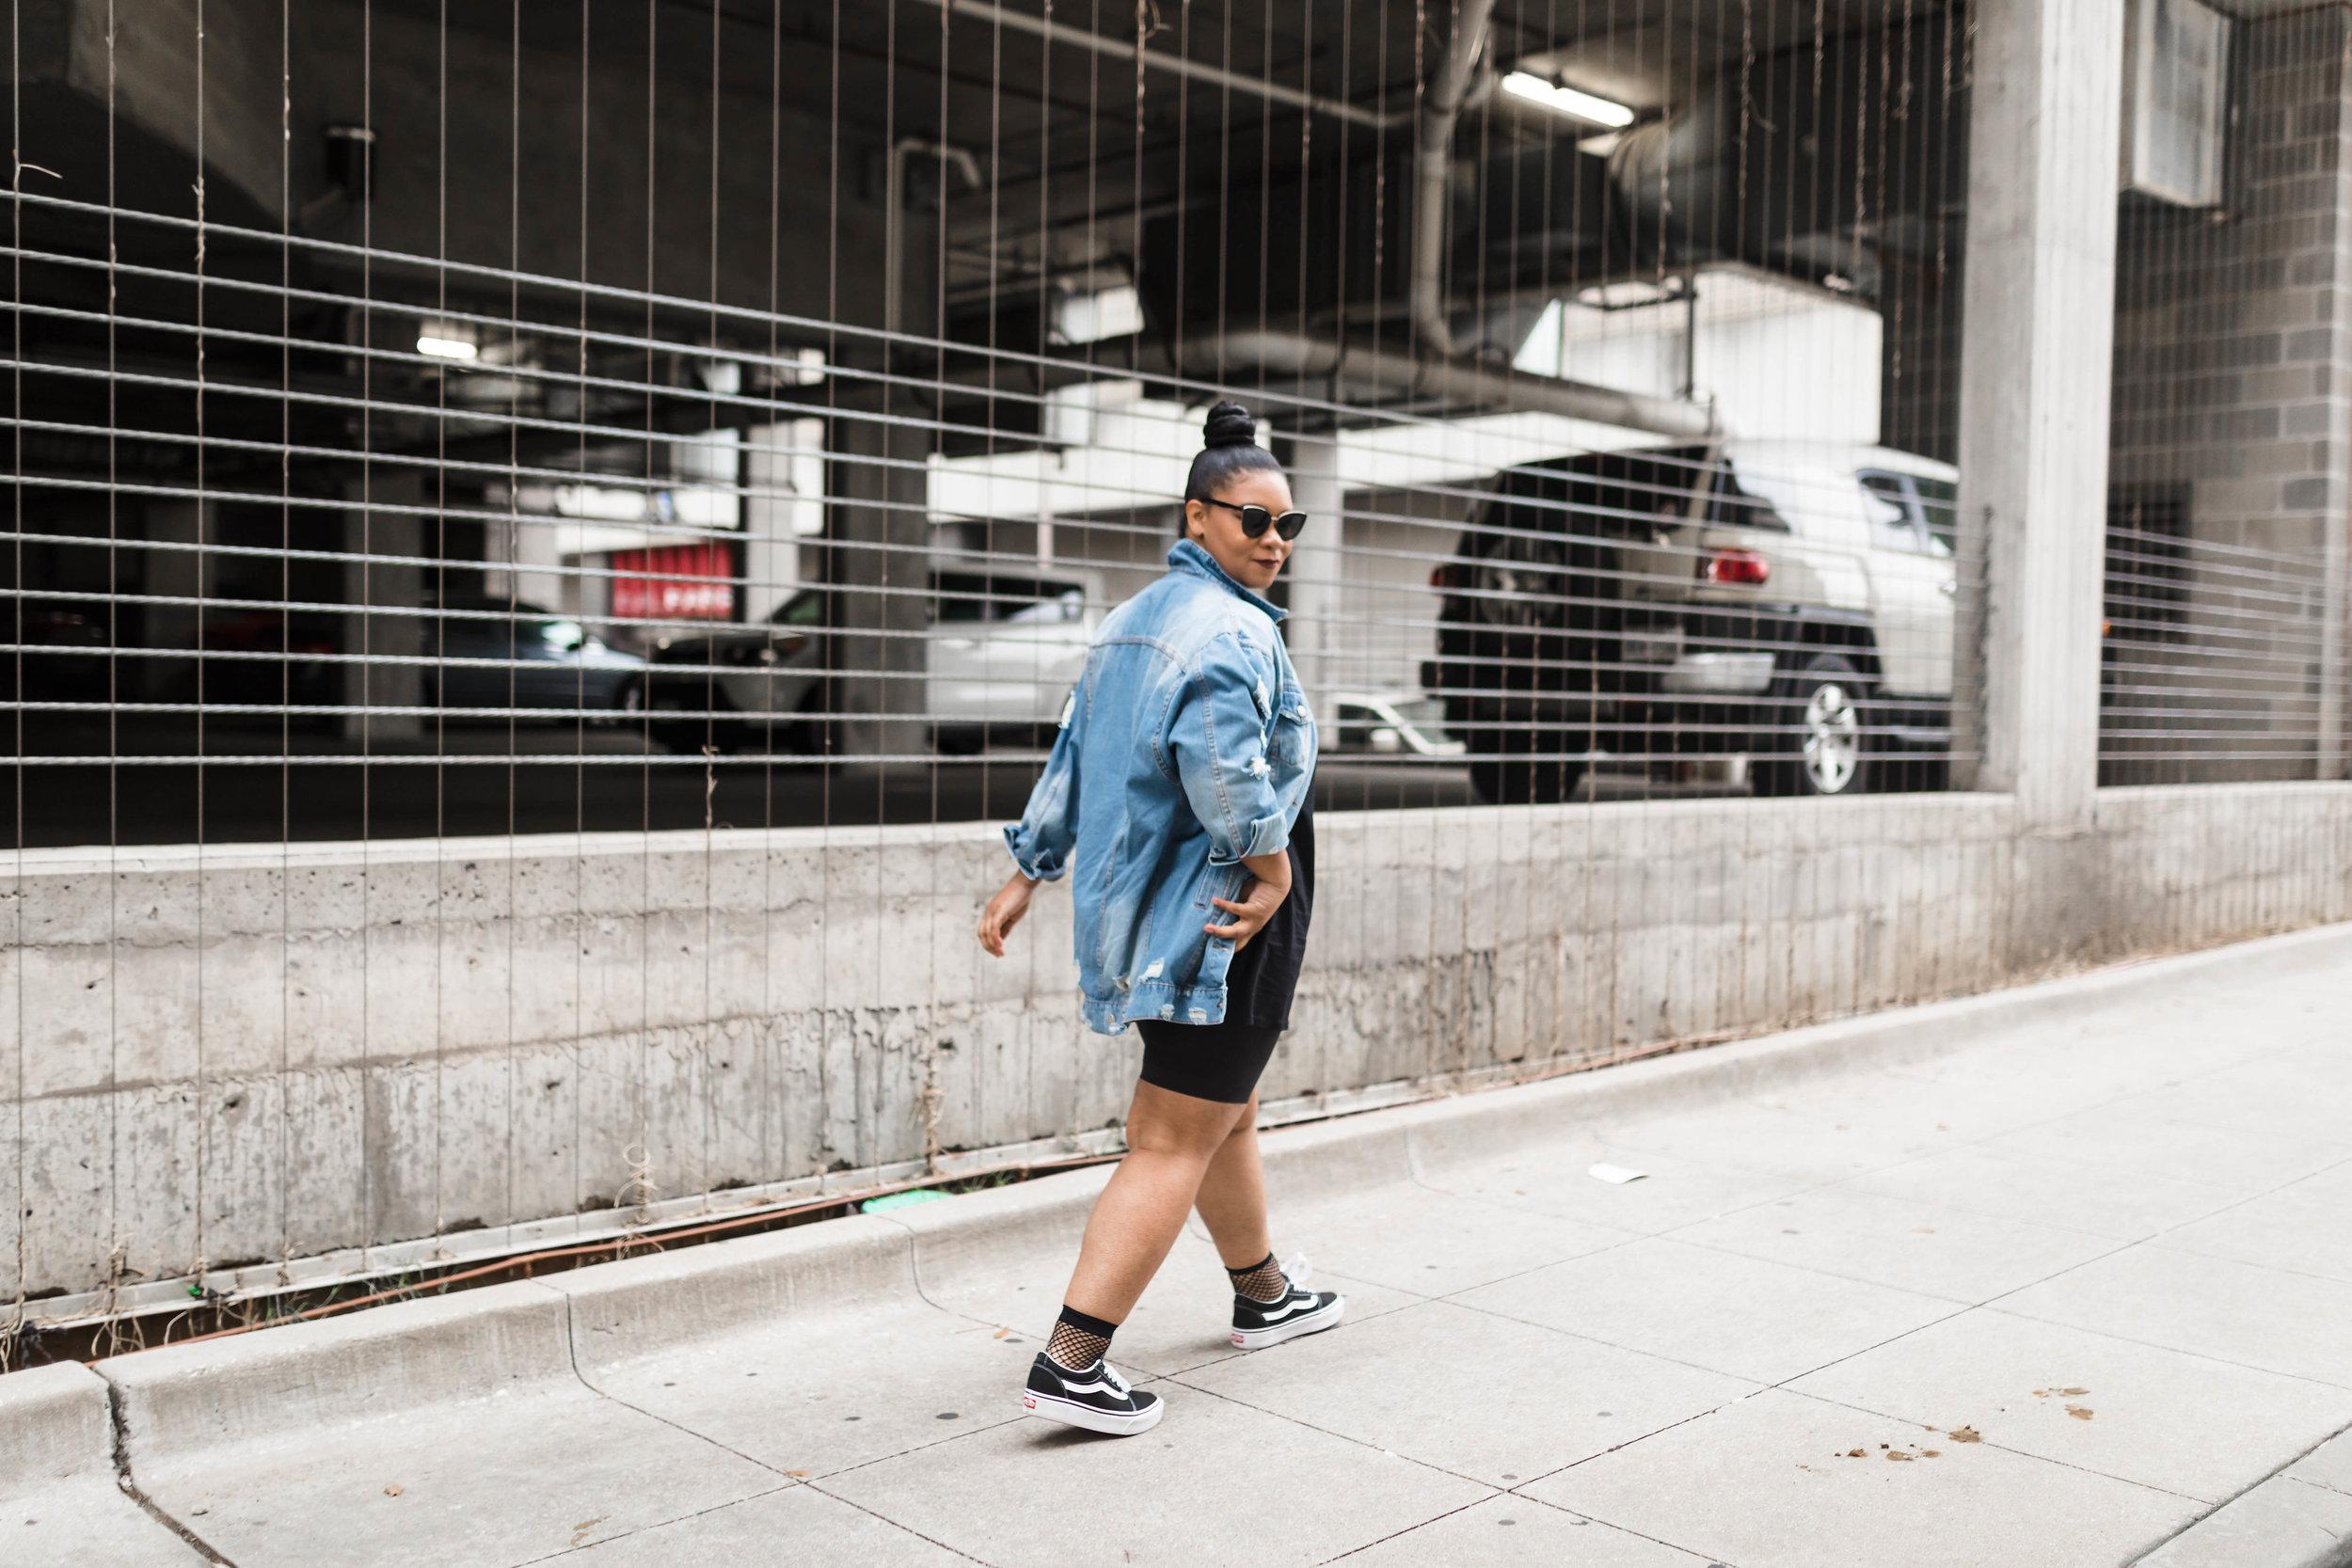 Street Styled: Platform Vans & All Black With Distressed Jacket - Natalie Greagor